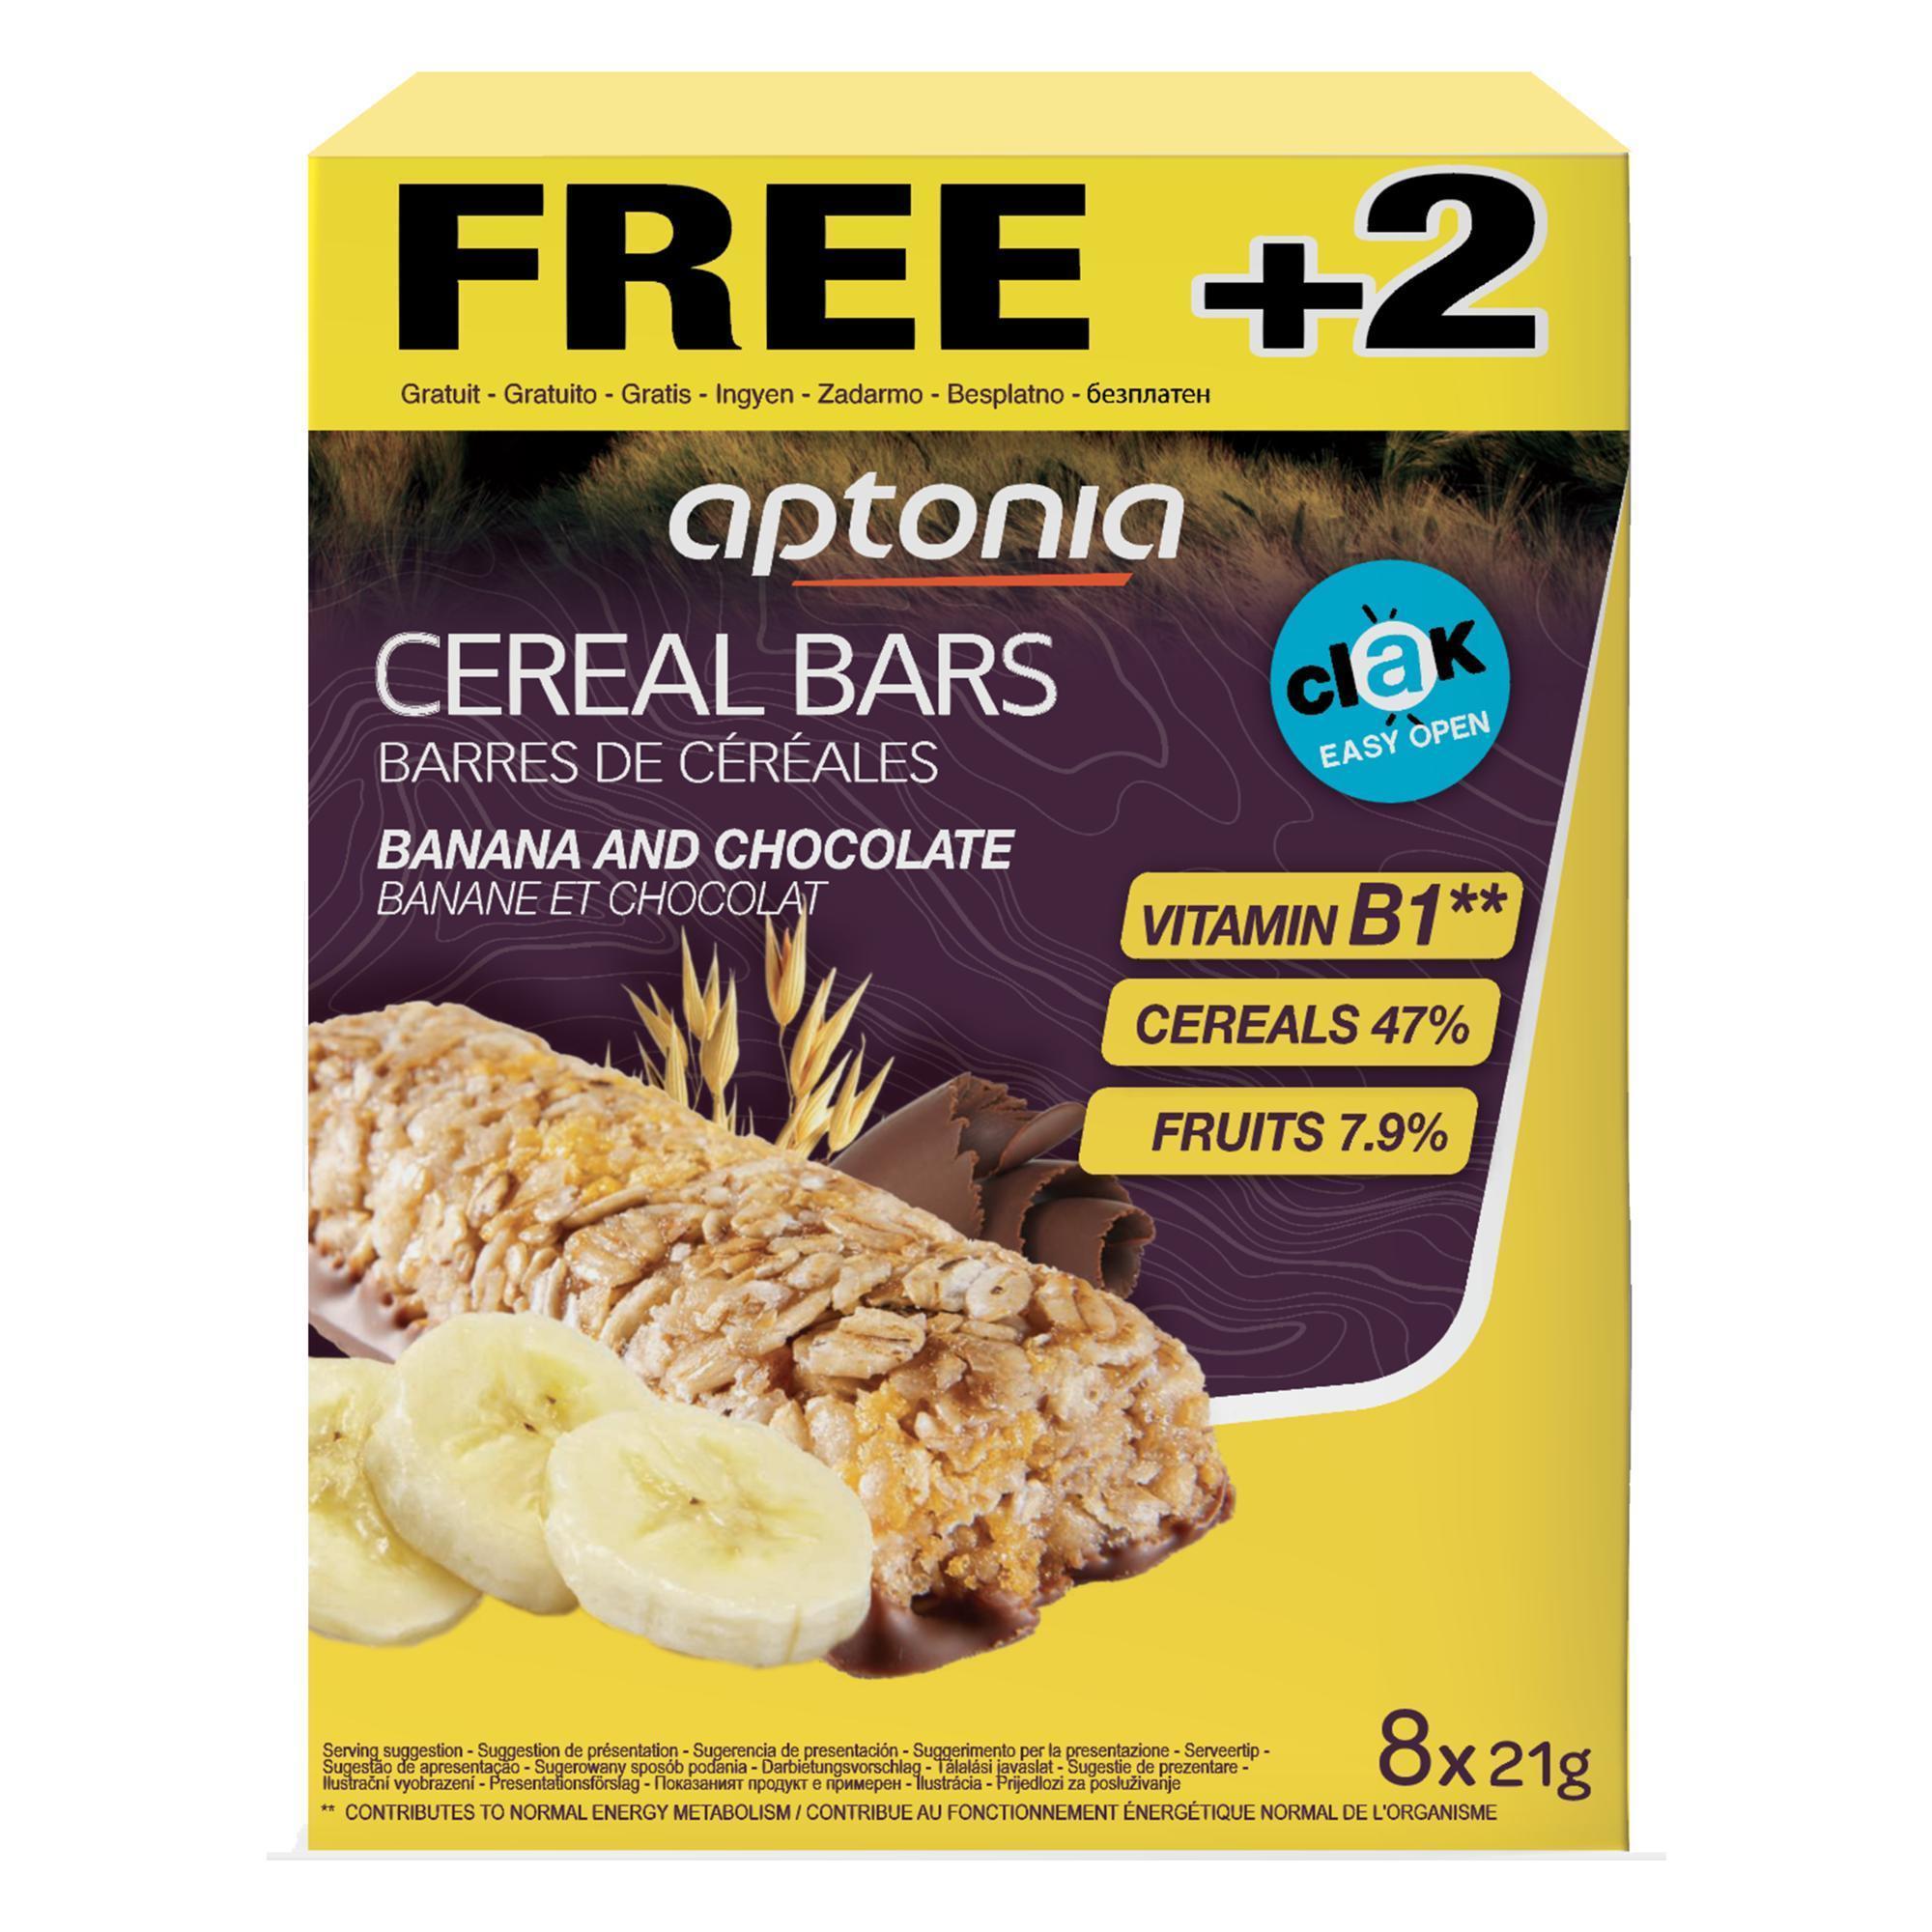 Aptonia Graanreep Clak chocolade banaan 6x 21 g + 2 GRATIS